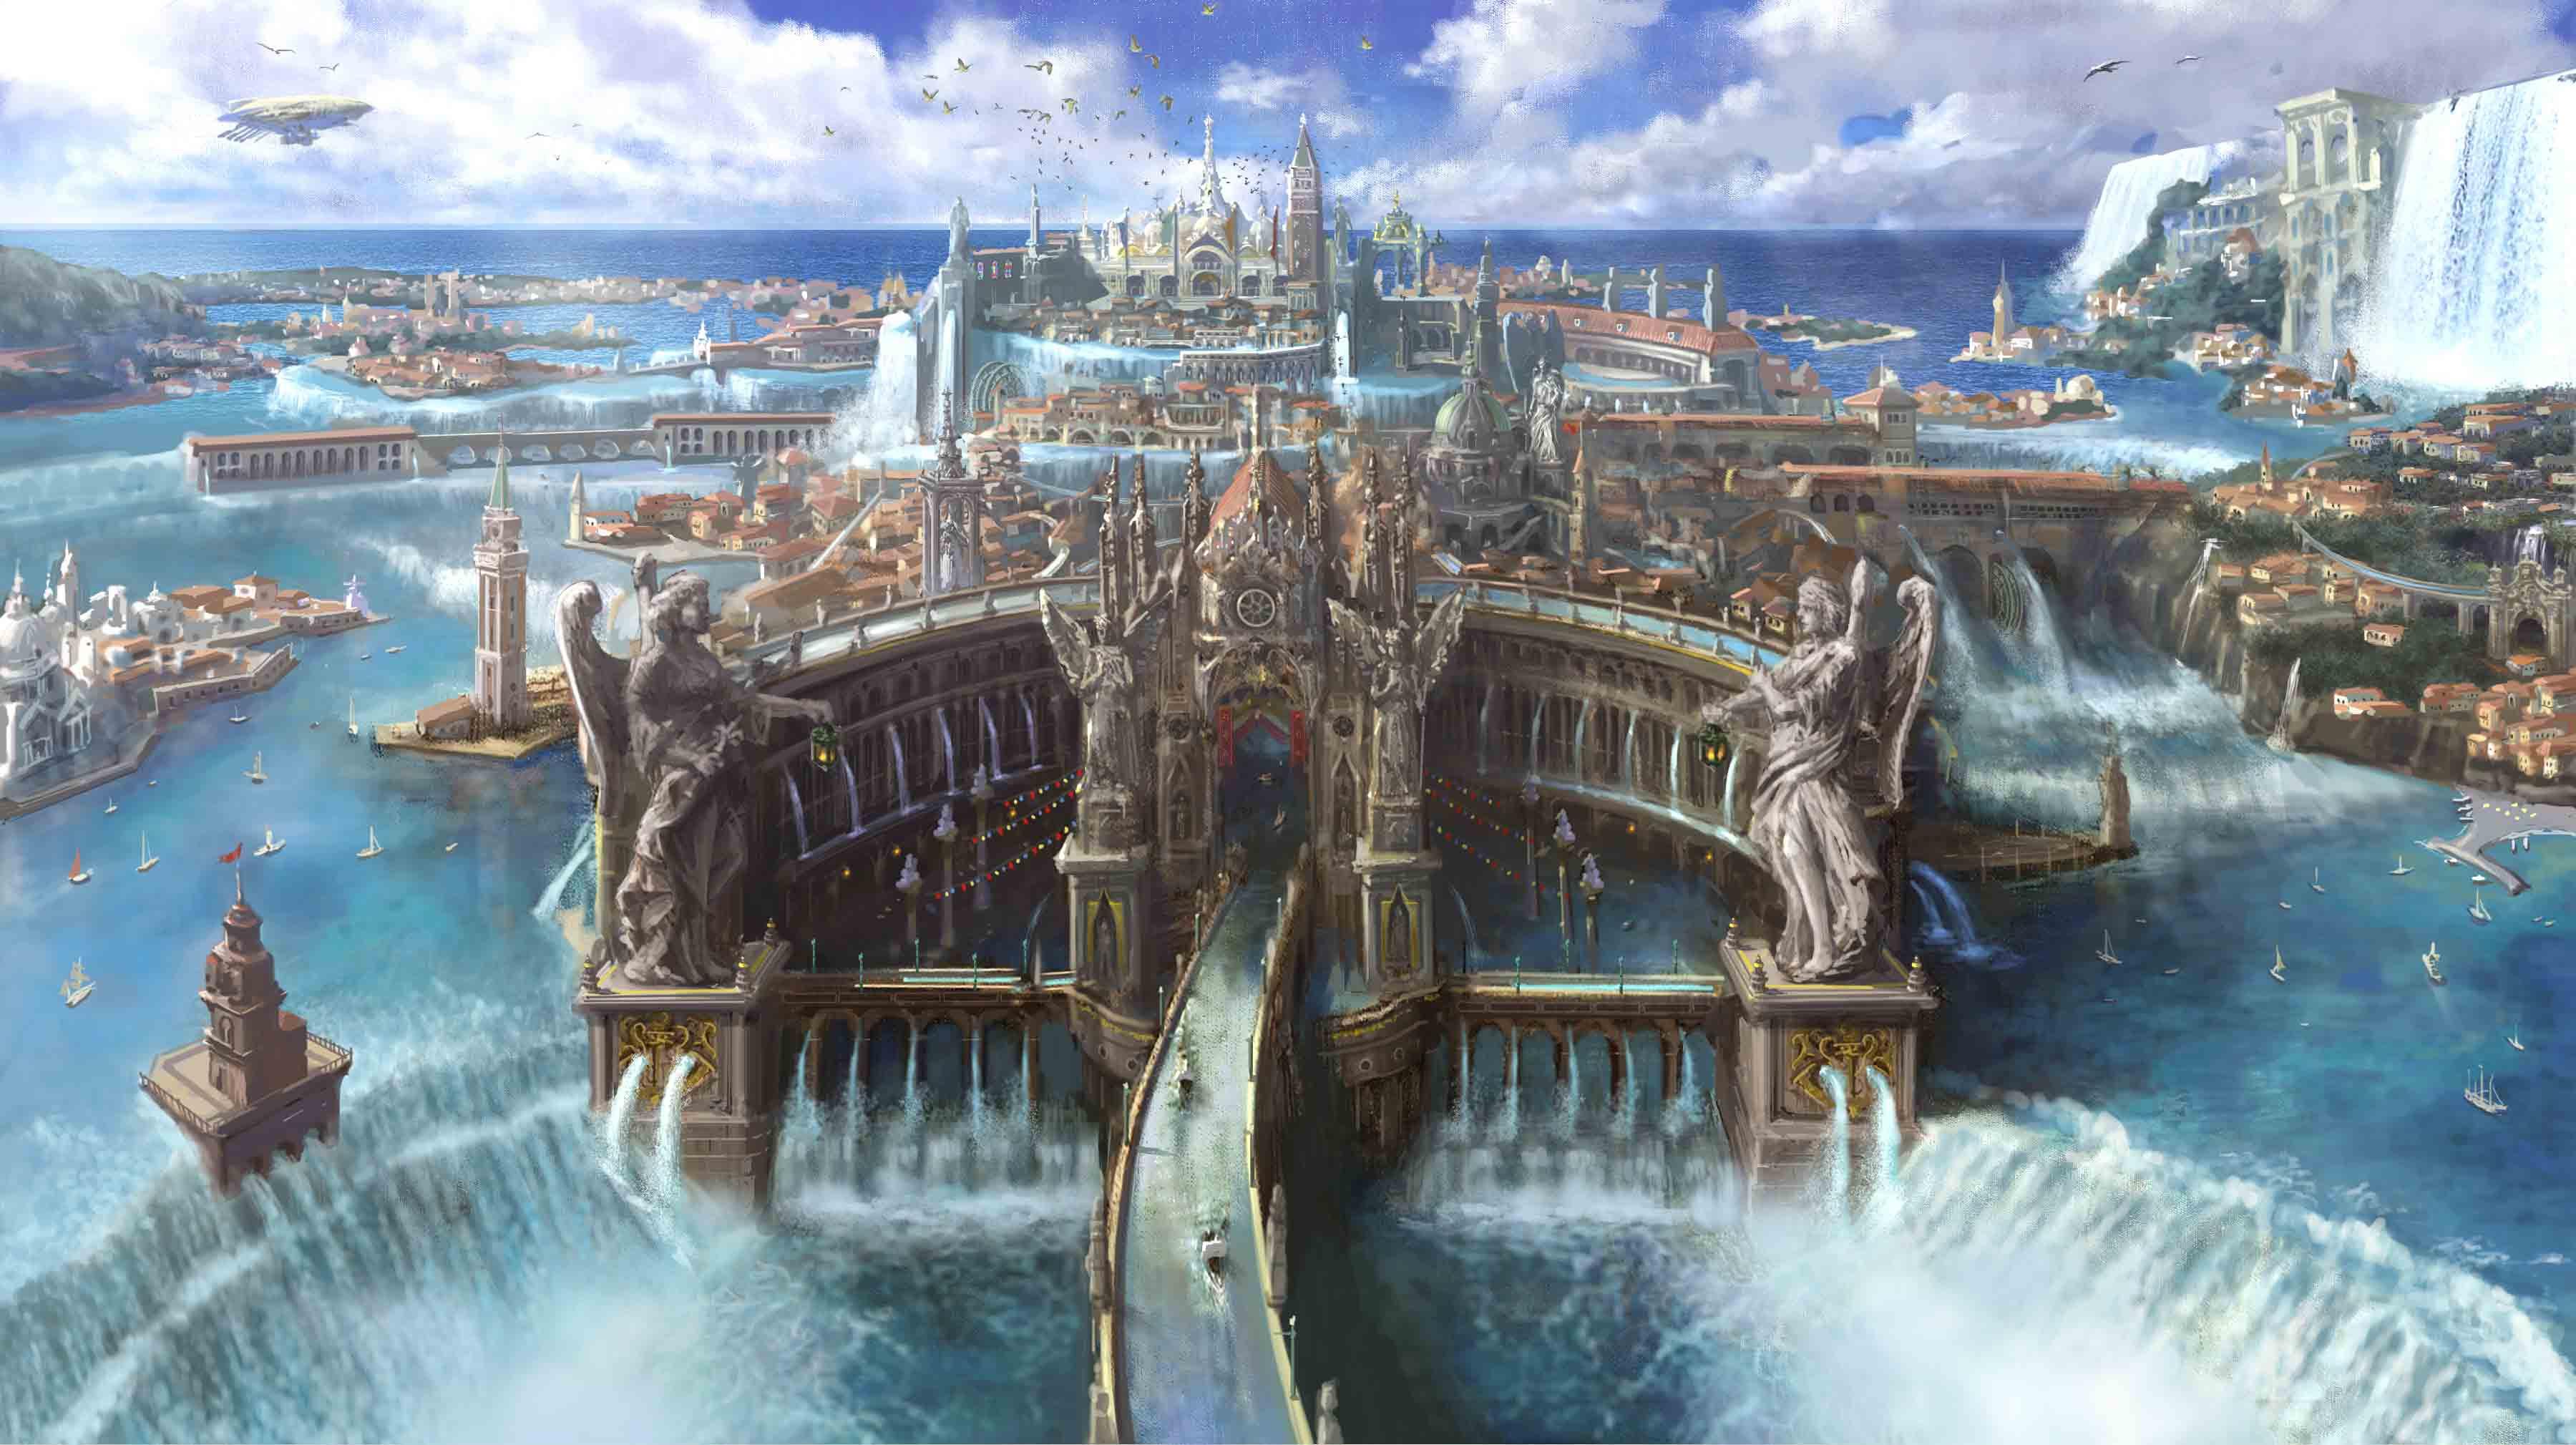 HD Wallpaper   Background ID:766878. Video Game Final Fantasy XV.  5 Like. Favorite. CrazyDiamond